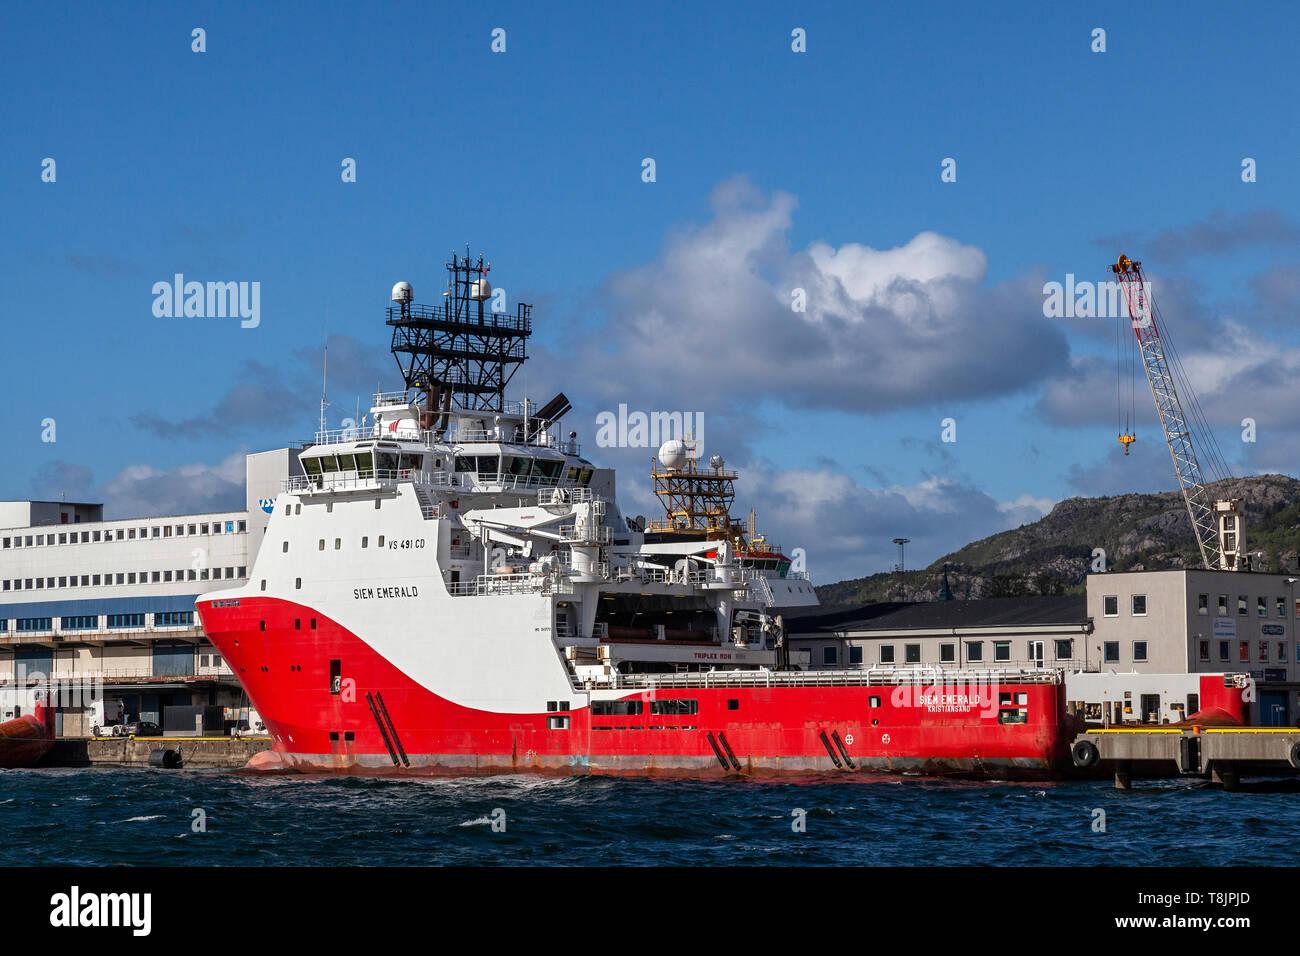 Offshore AHTS Anchor Handling Tug Supply Vessel Siem Emerald bei Dokkeskjaerskaien (Dokkeskjaerskaien) Terminal im Hafen von Bergen, Norwegen Anker. Stockbild